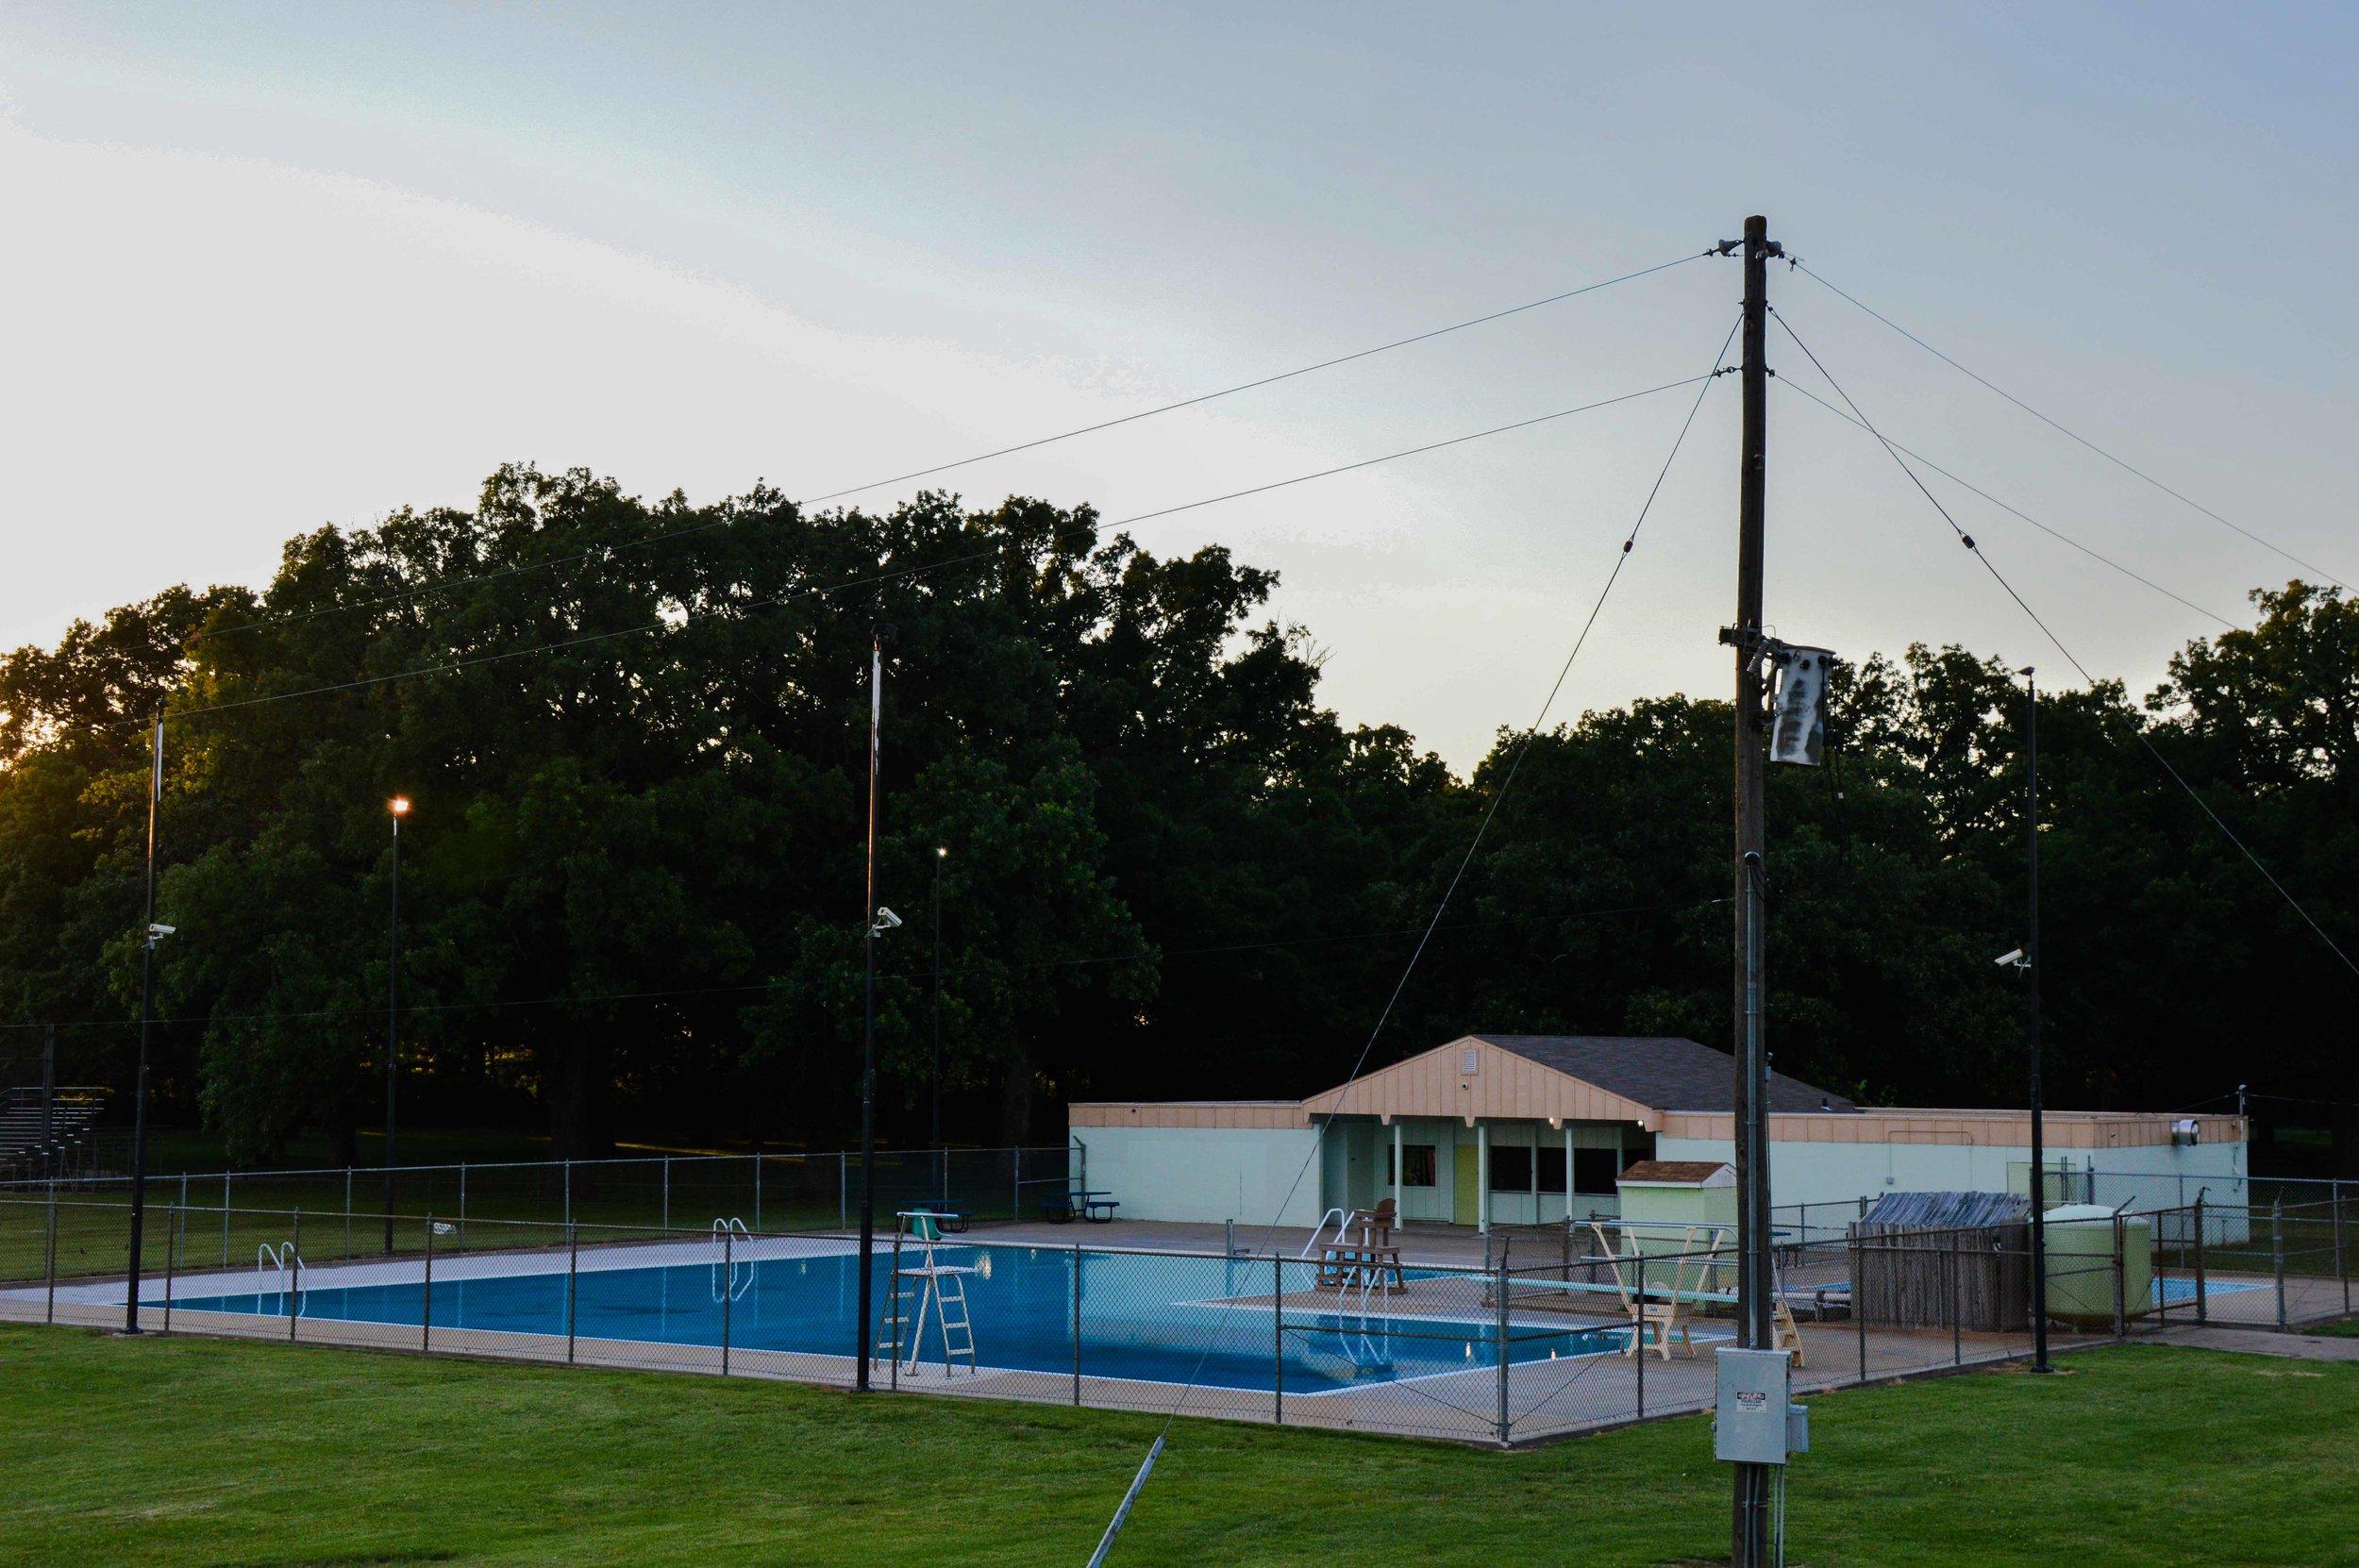 Oakland Billiard Pool   Client: Shawnee County Parks and Recreation Architect: Schwerdt Design Group